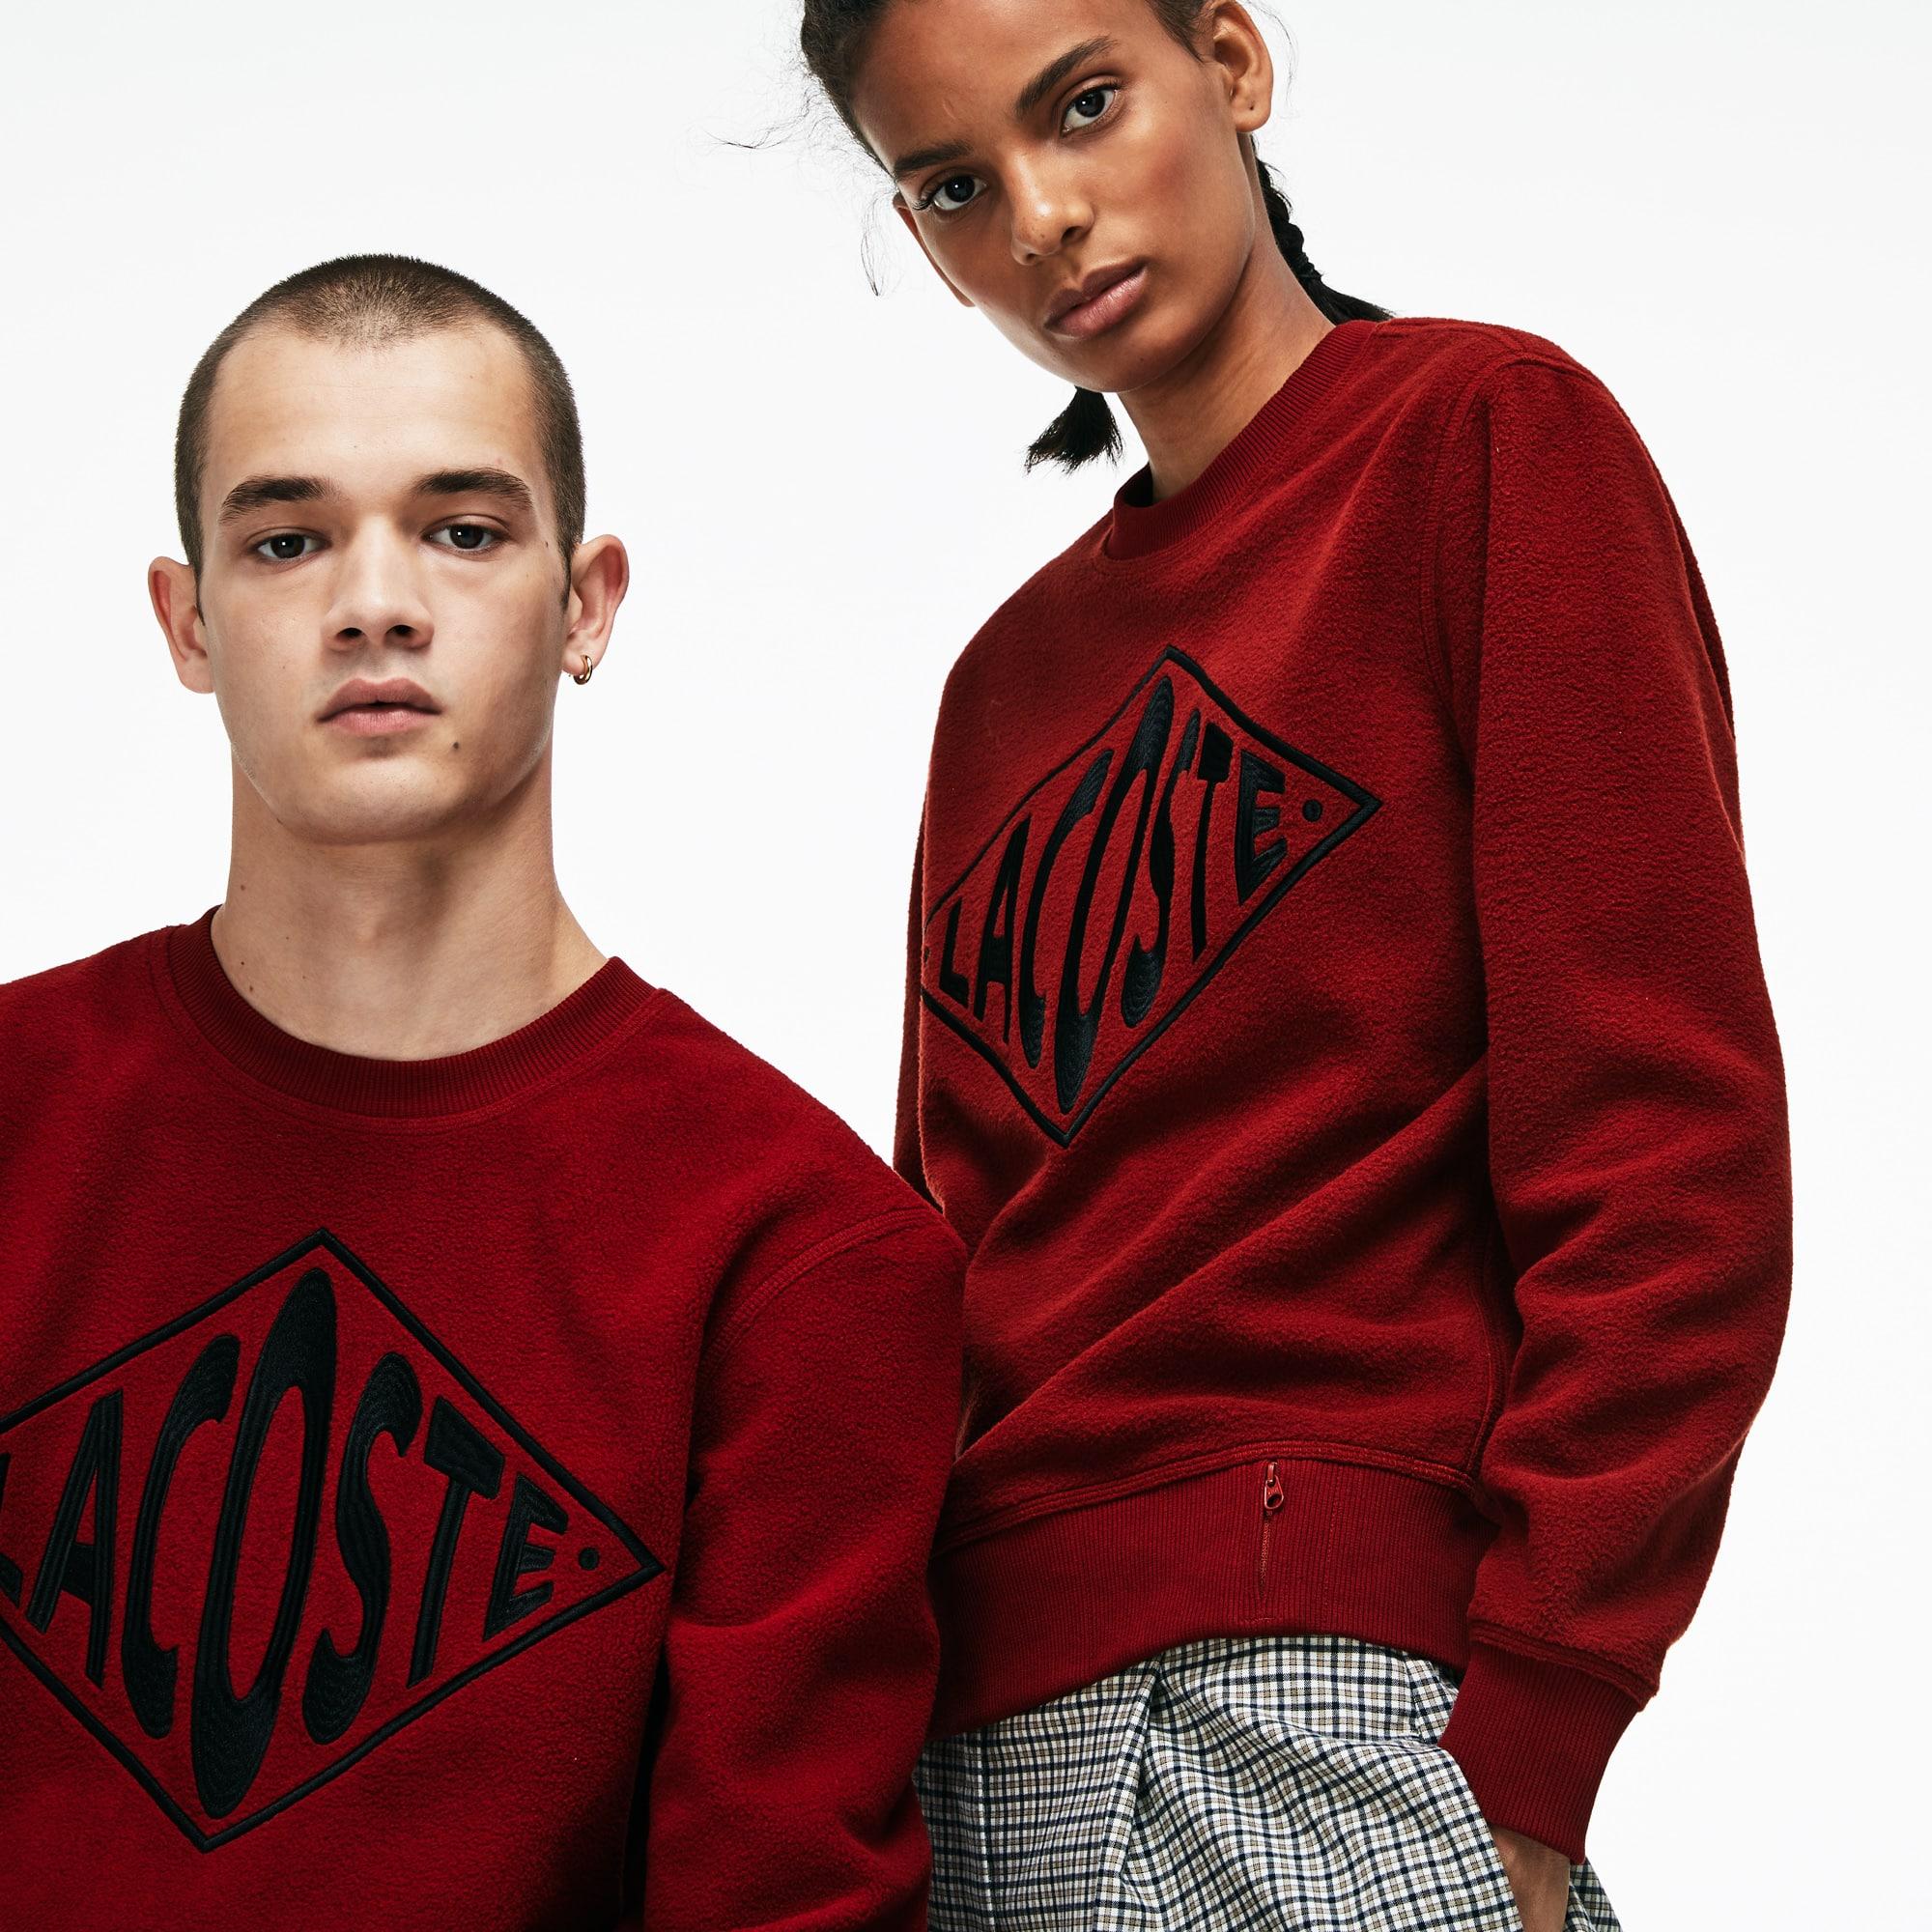 Unisex LIVE Crew Neck XL Embroidery Fleece Sweatshirt